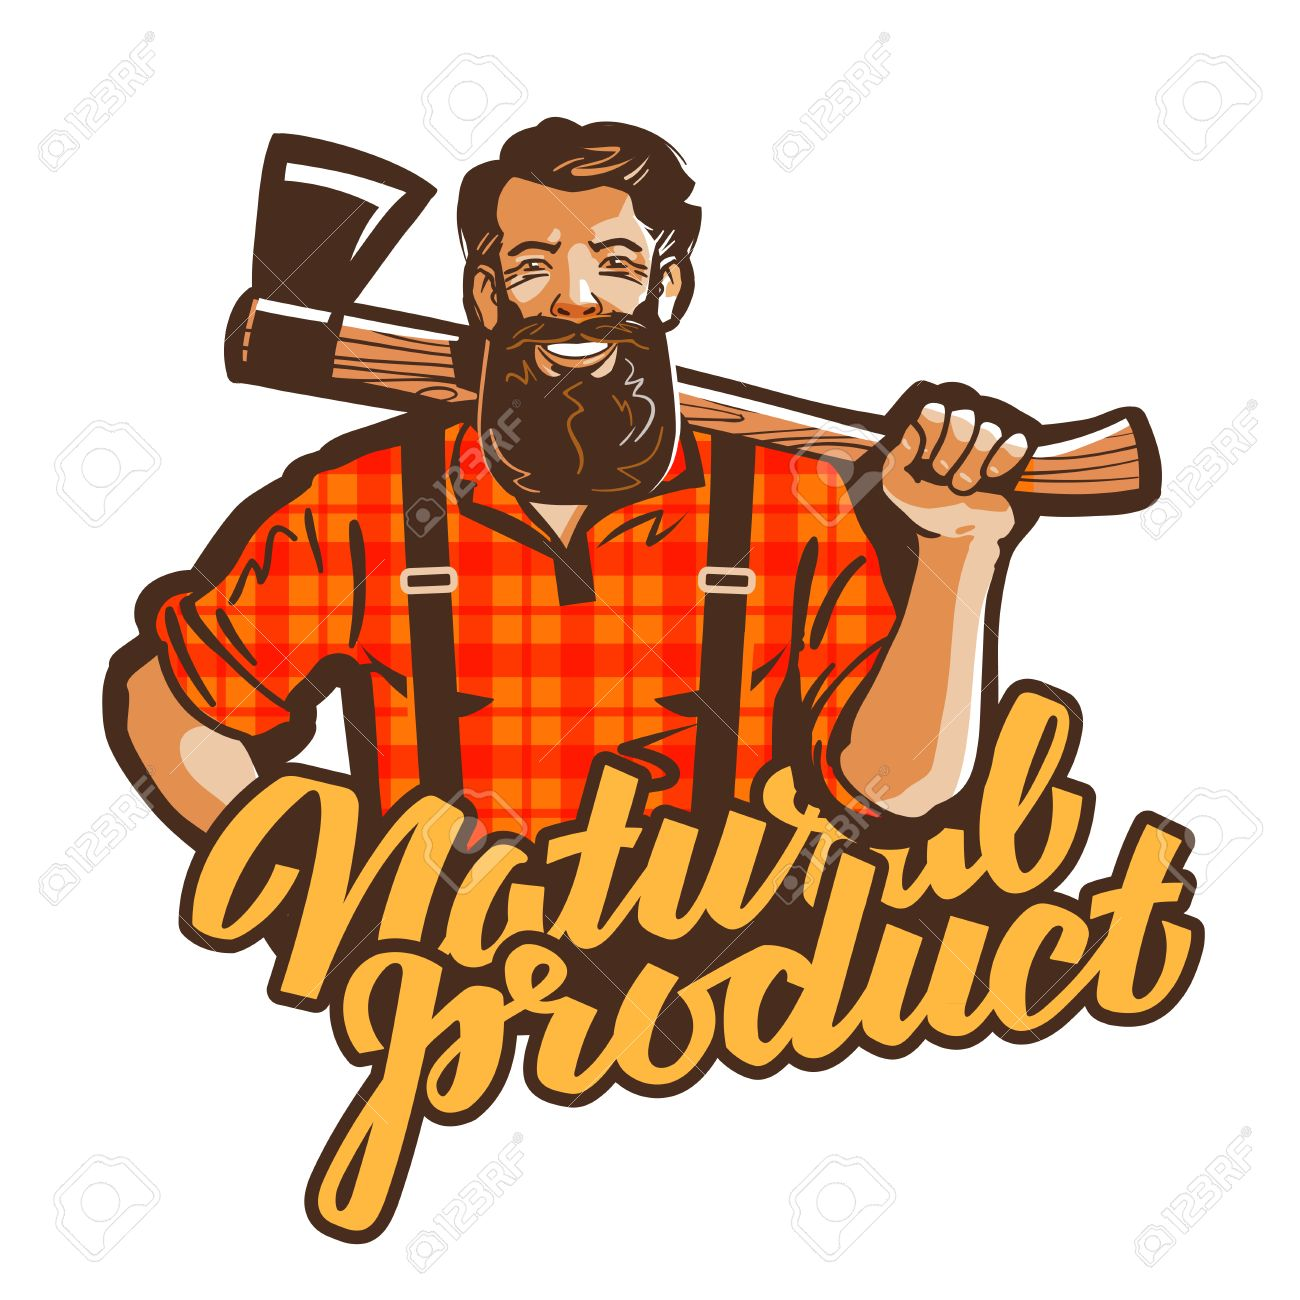 Free carpenter cutter download. Carpentry clipart wood tech